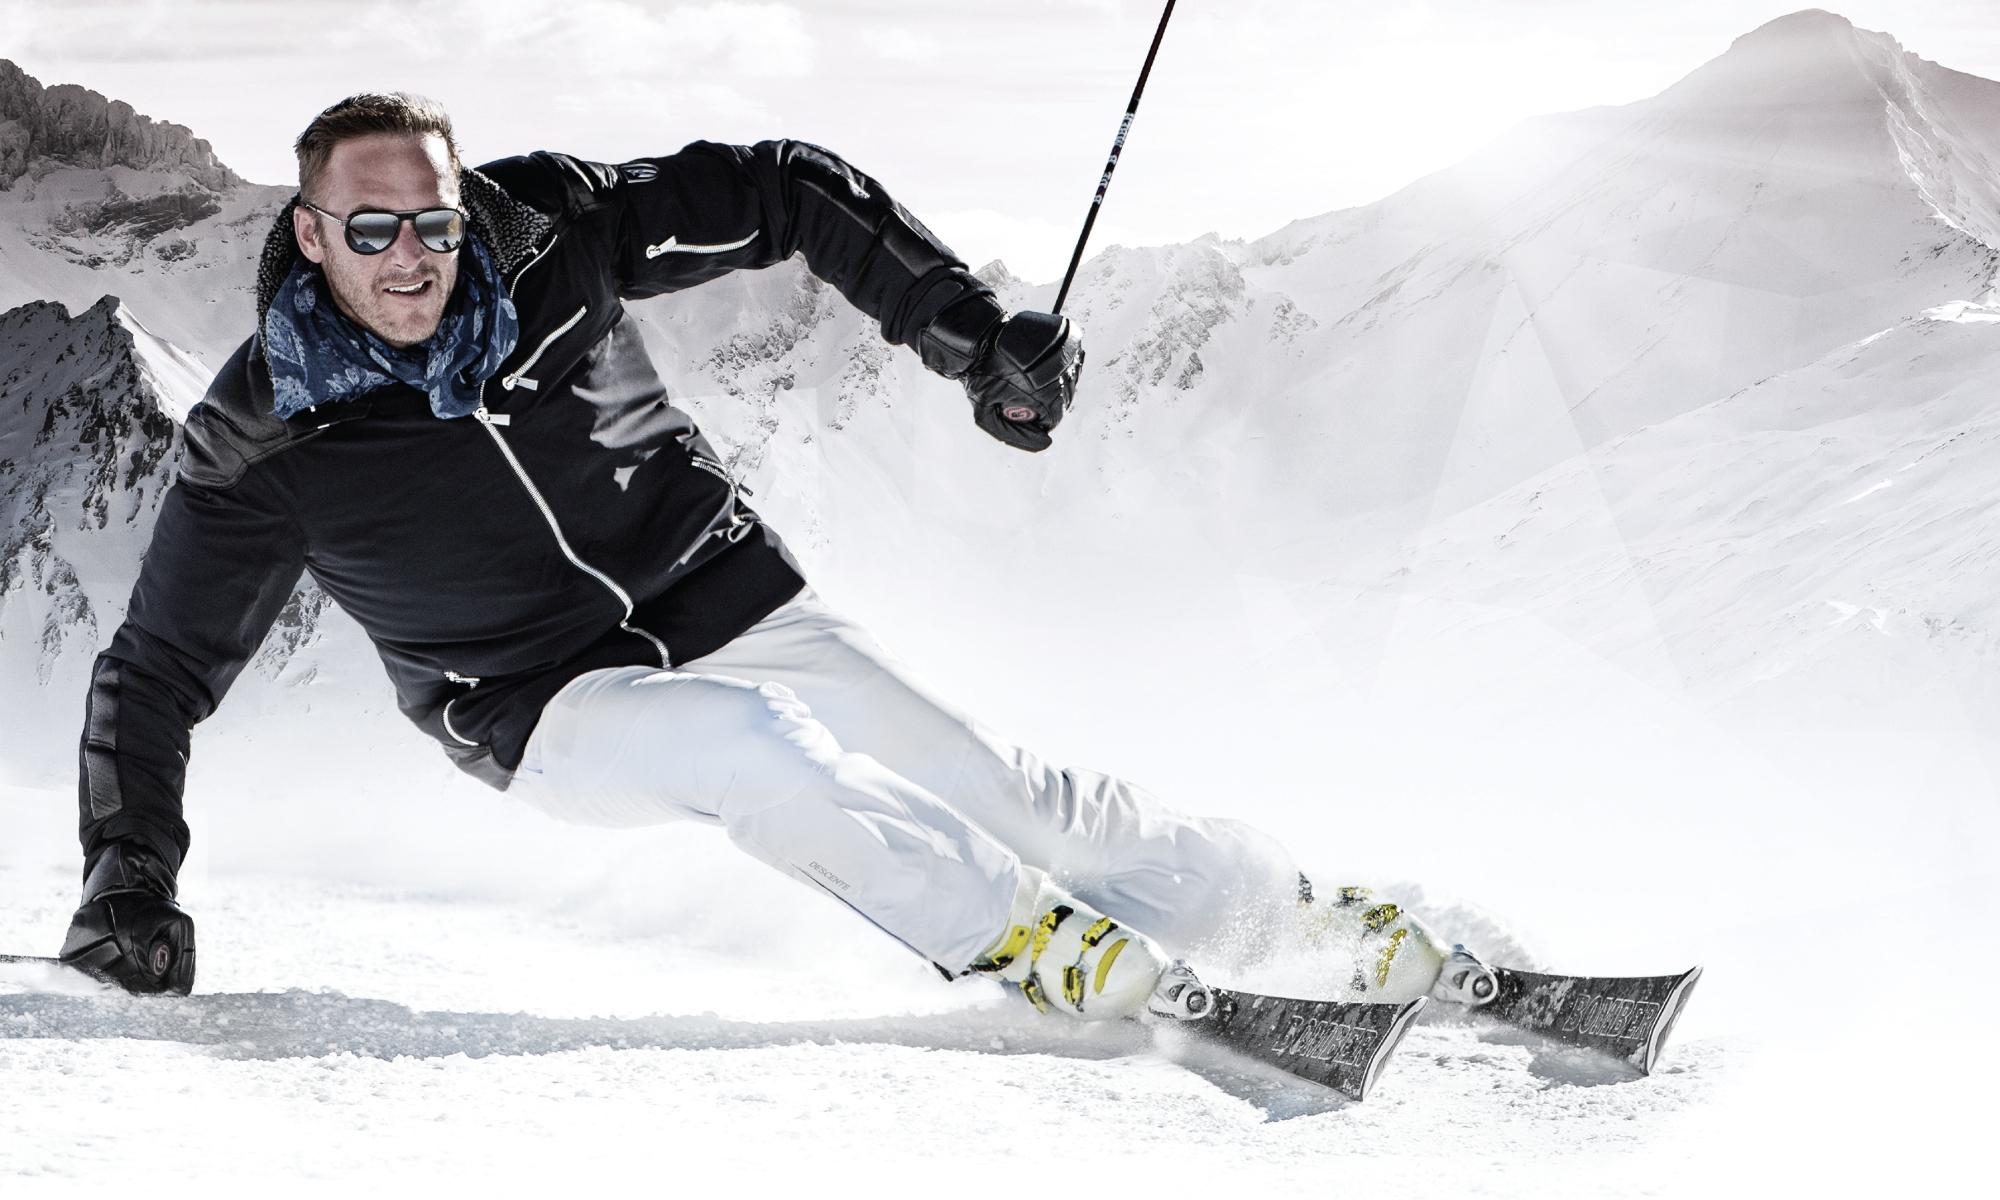 Bode Miler - Bomber Ski